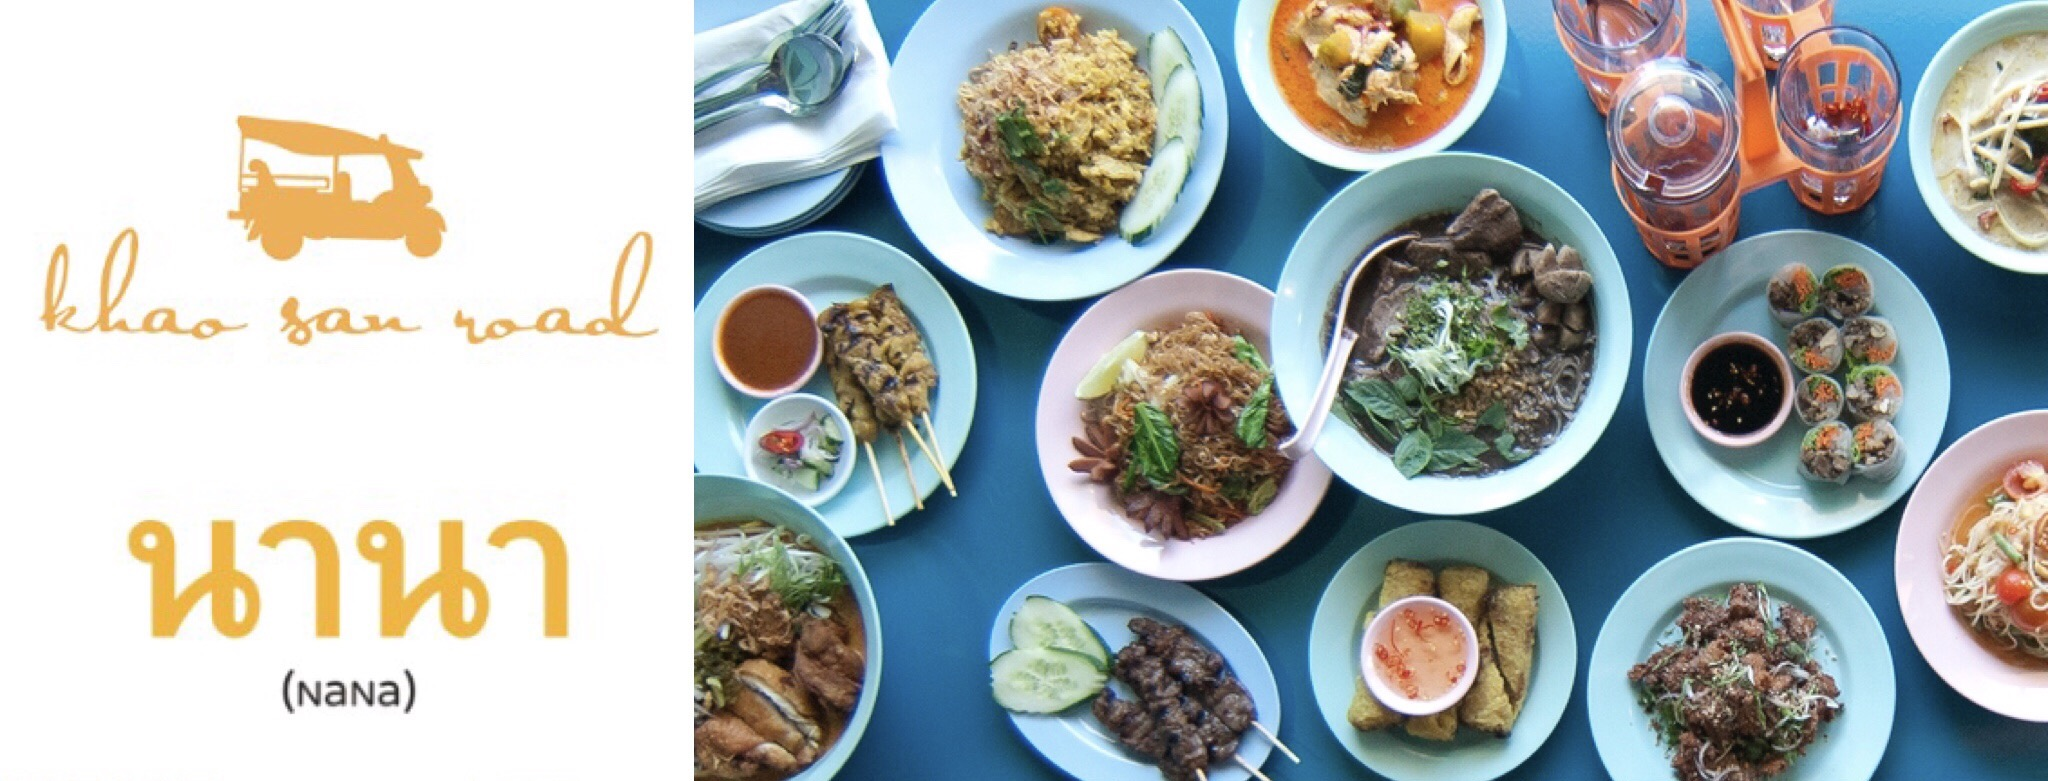 Photograph of Thai food from Nana & Khao San Road